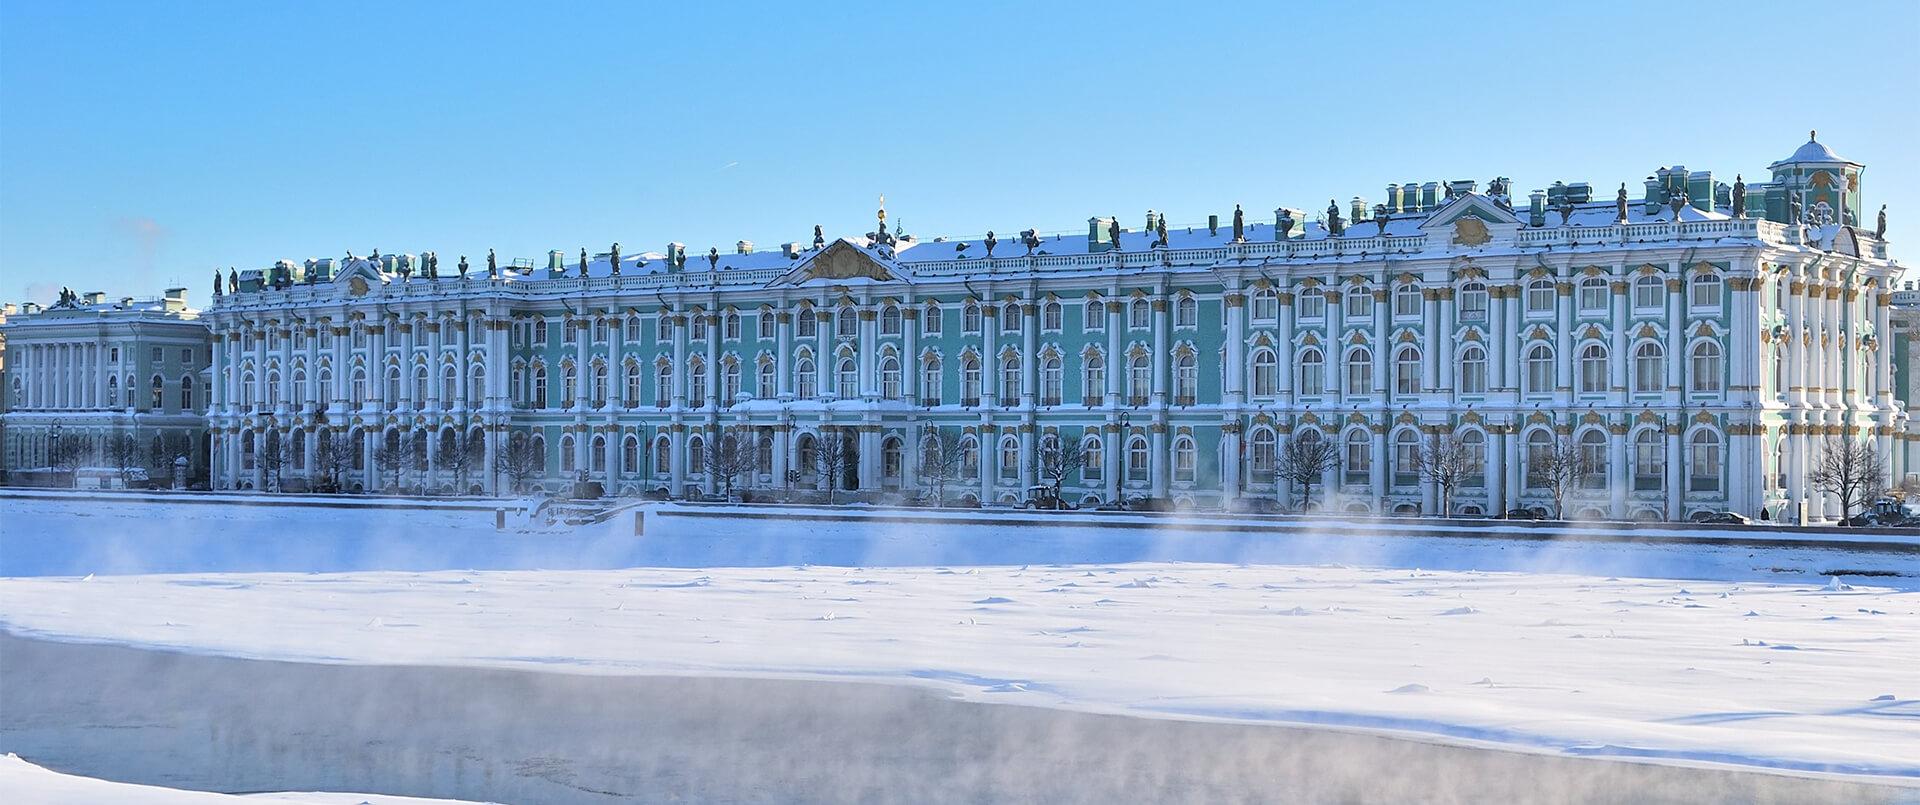 St. Petersburg: Treasures of the Russian Tsars